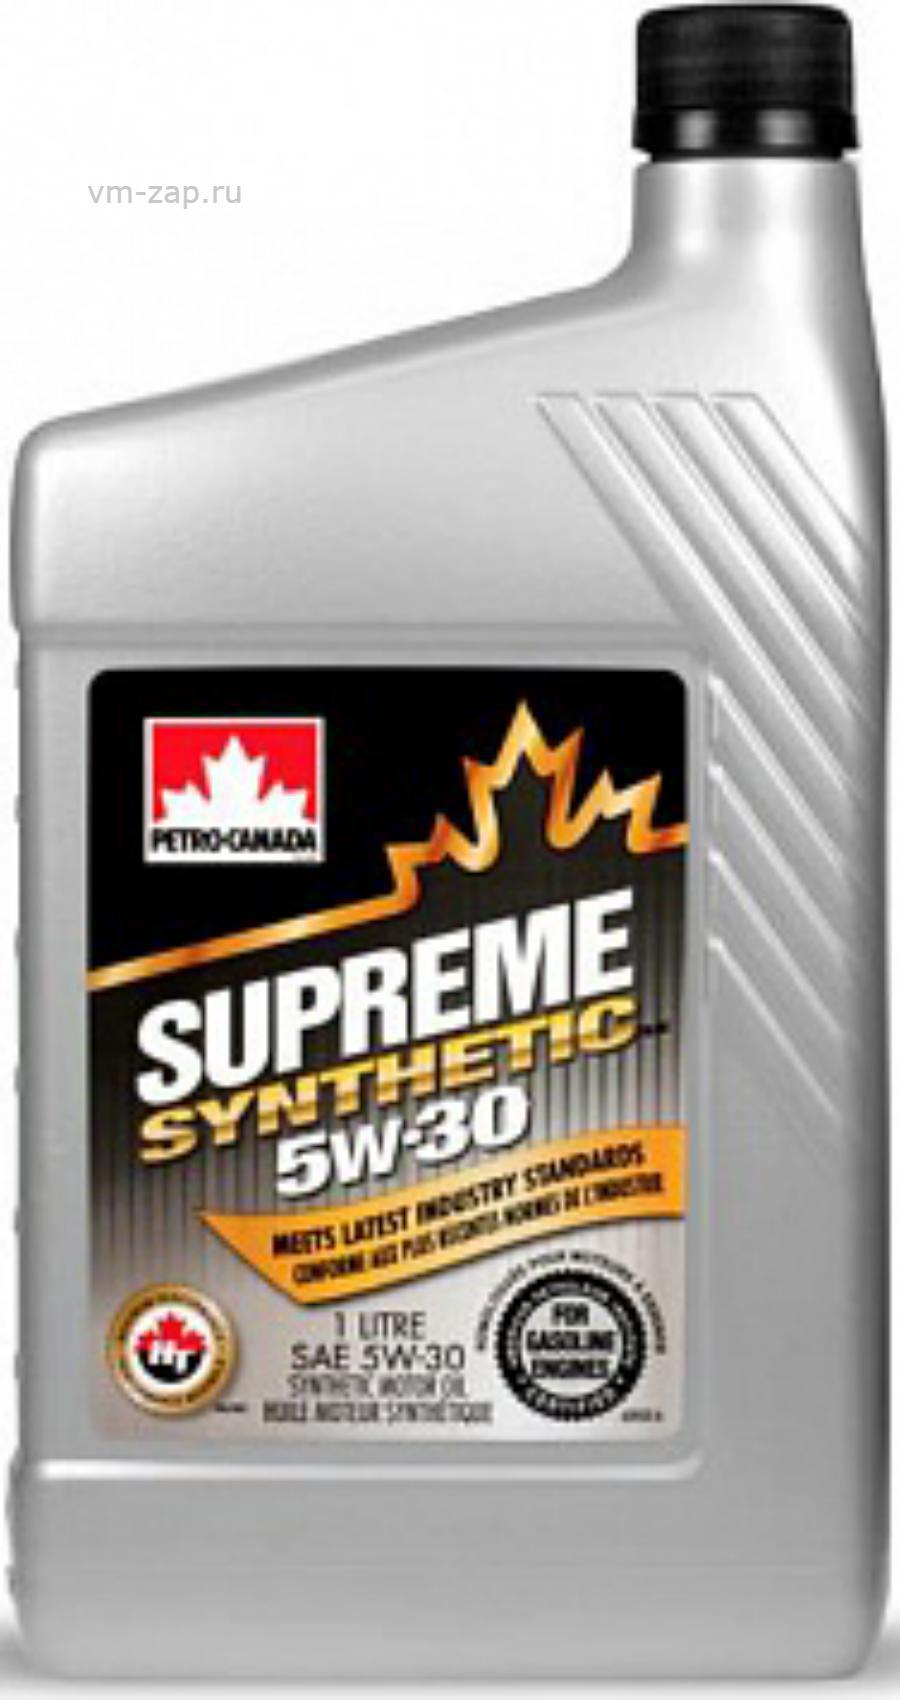 Масло моторное синтетическое Supreme Synthetic 5W-30, 1л